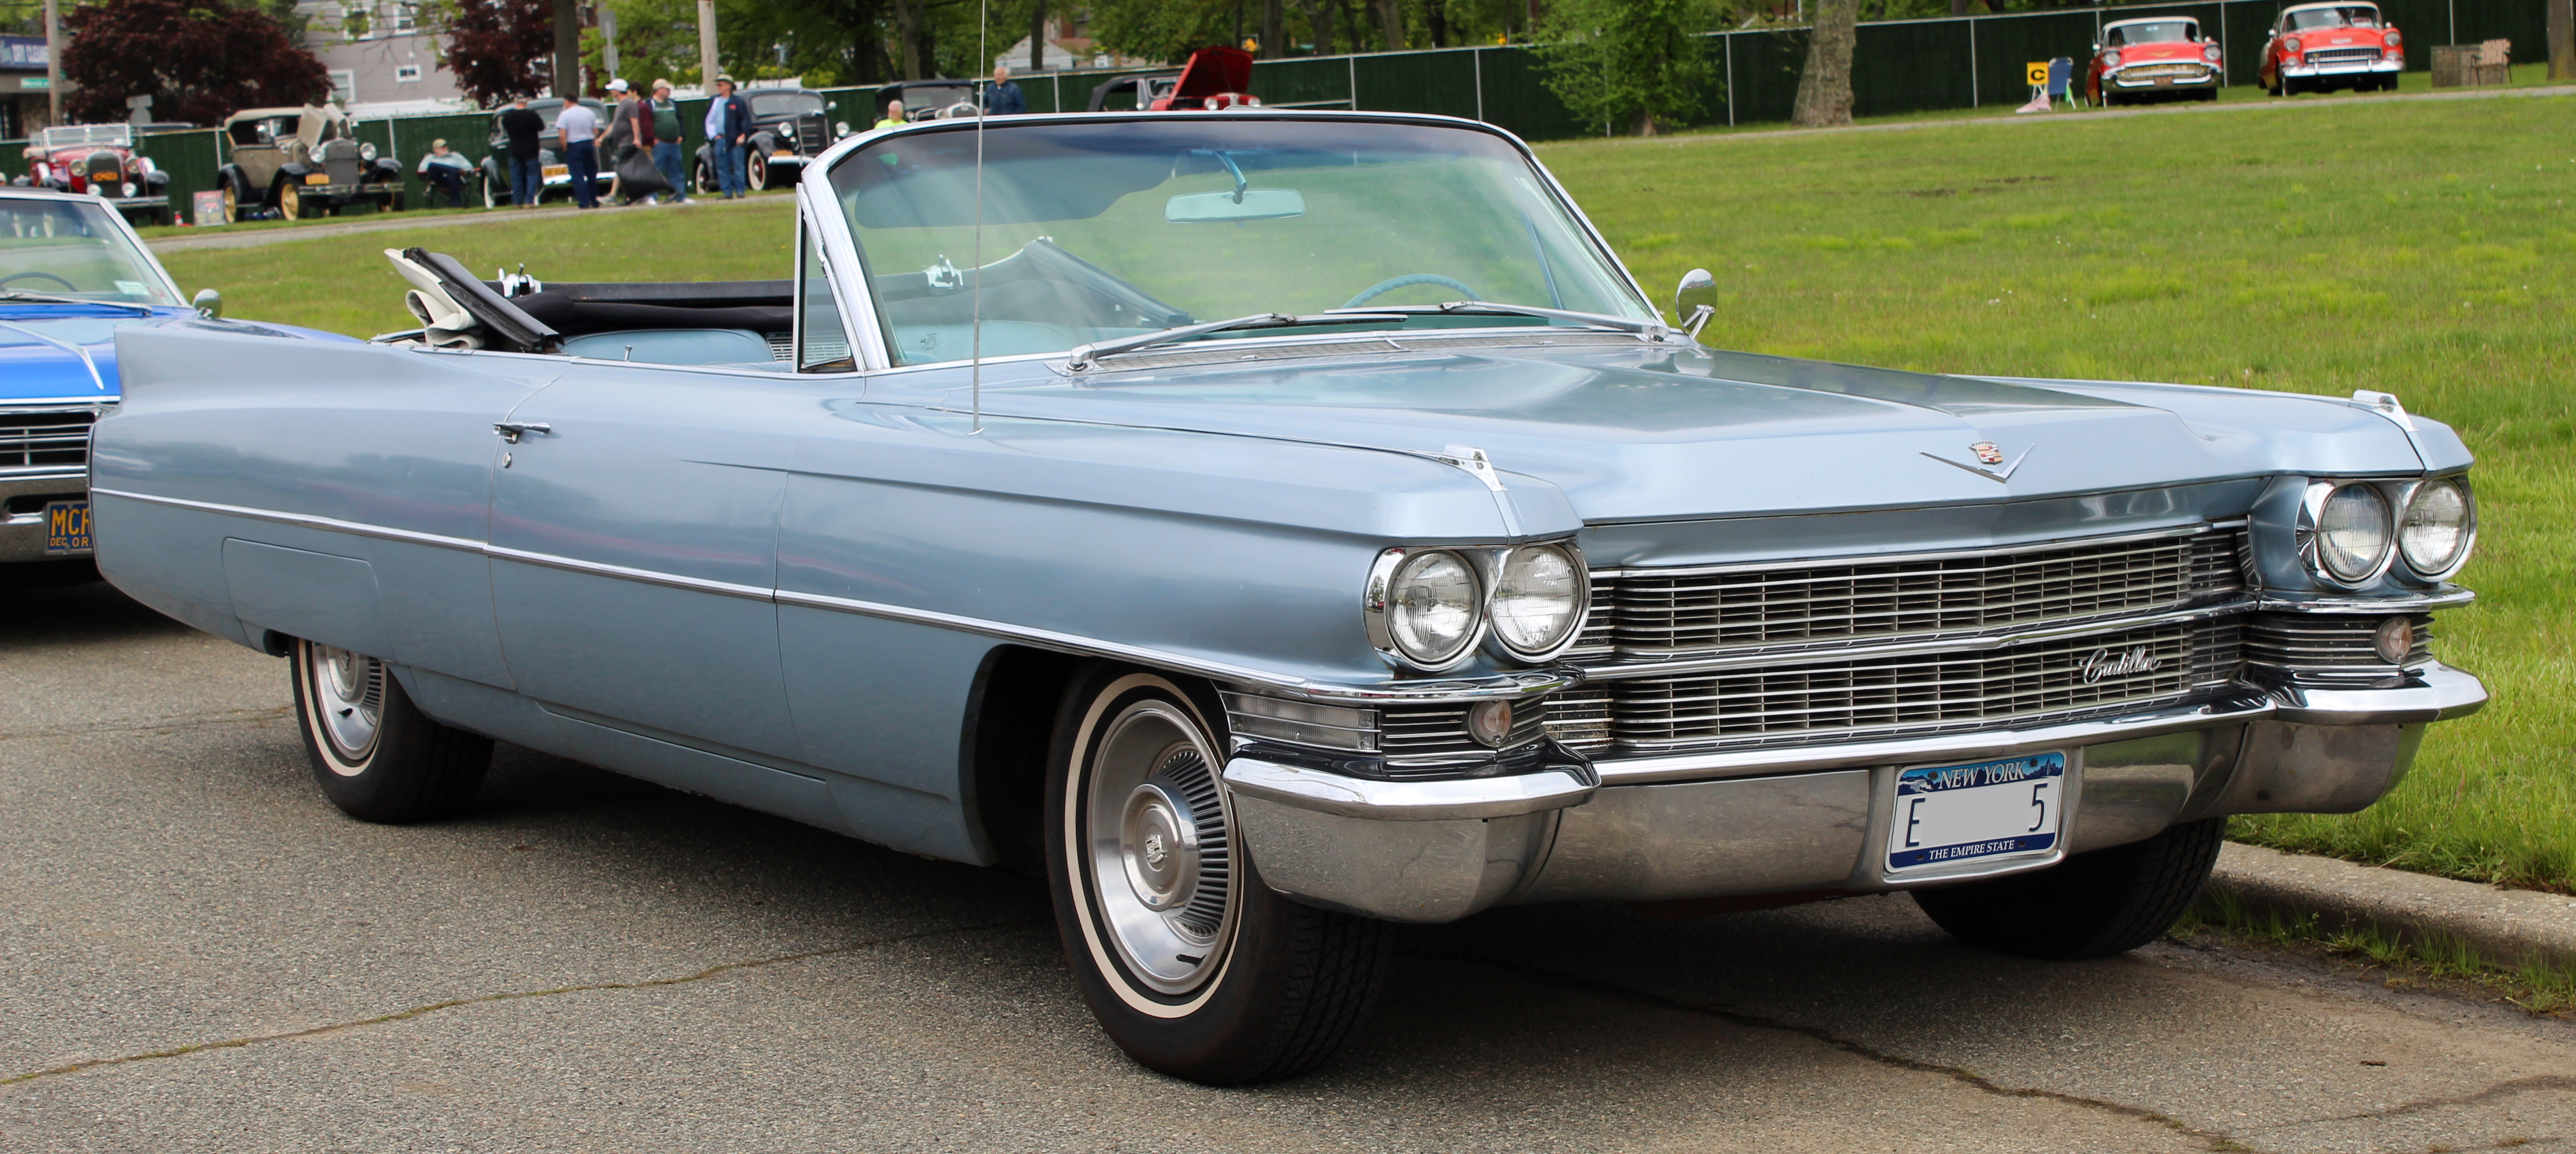 New Cadillac Eldorado >> File 1963 Cadillac Eldorado Convertible Front 5 19 19 Jpg